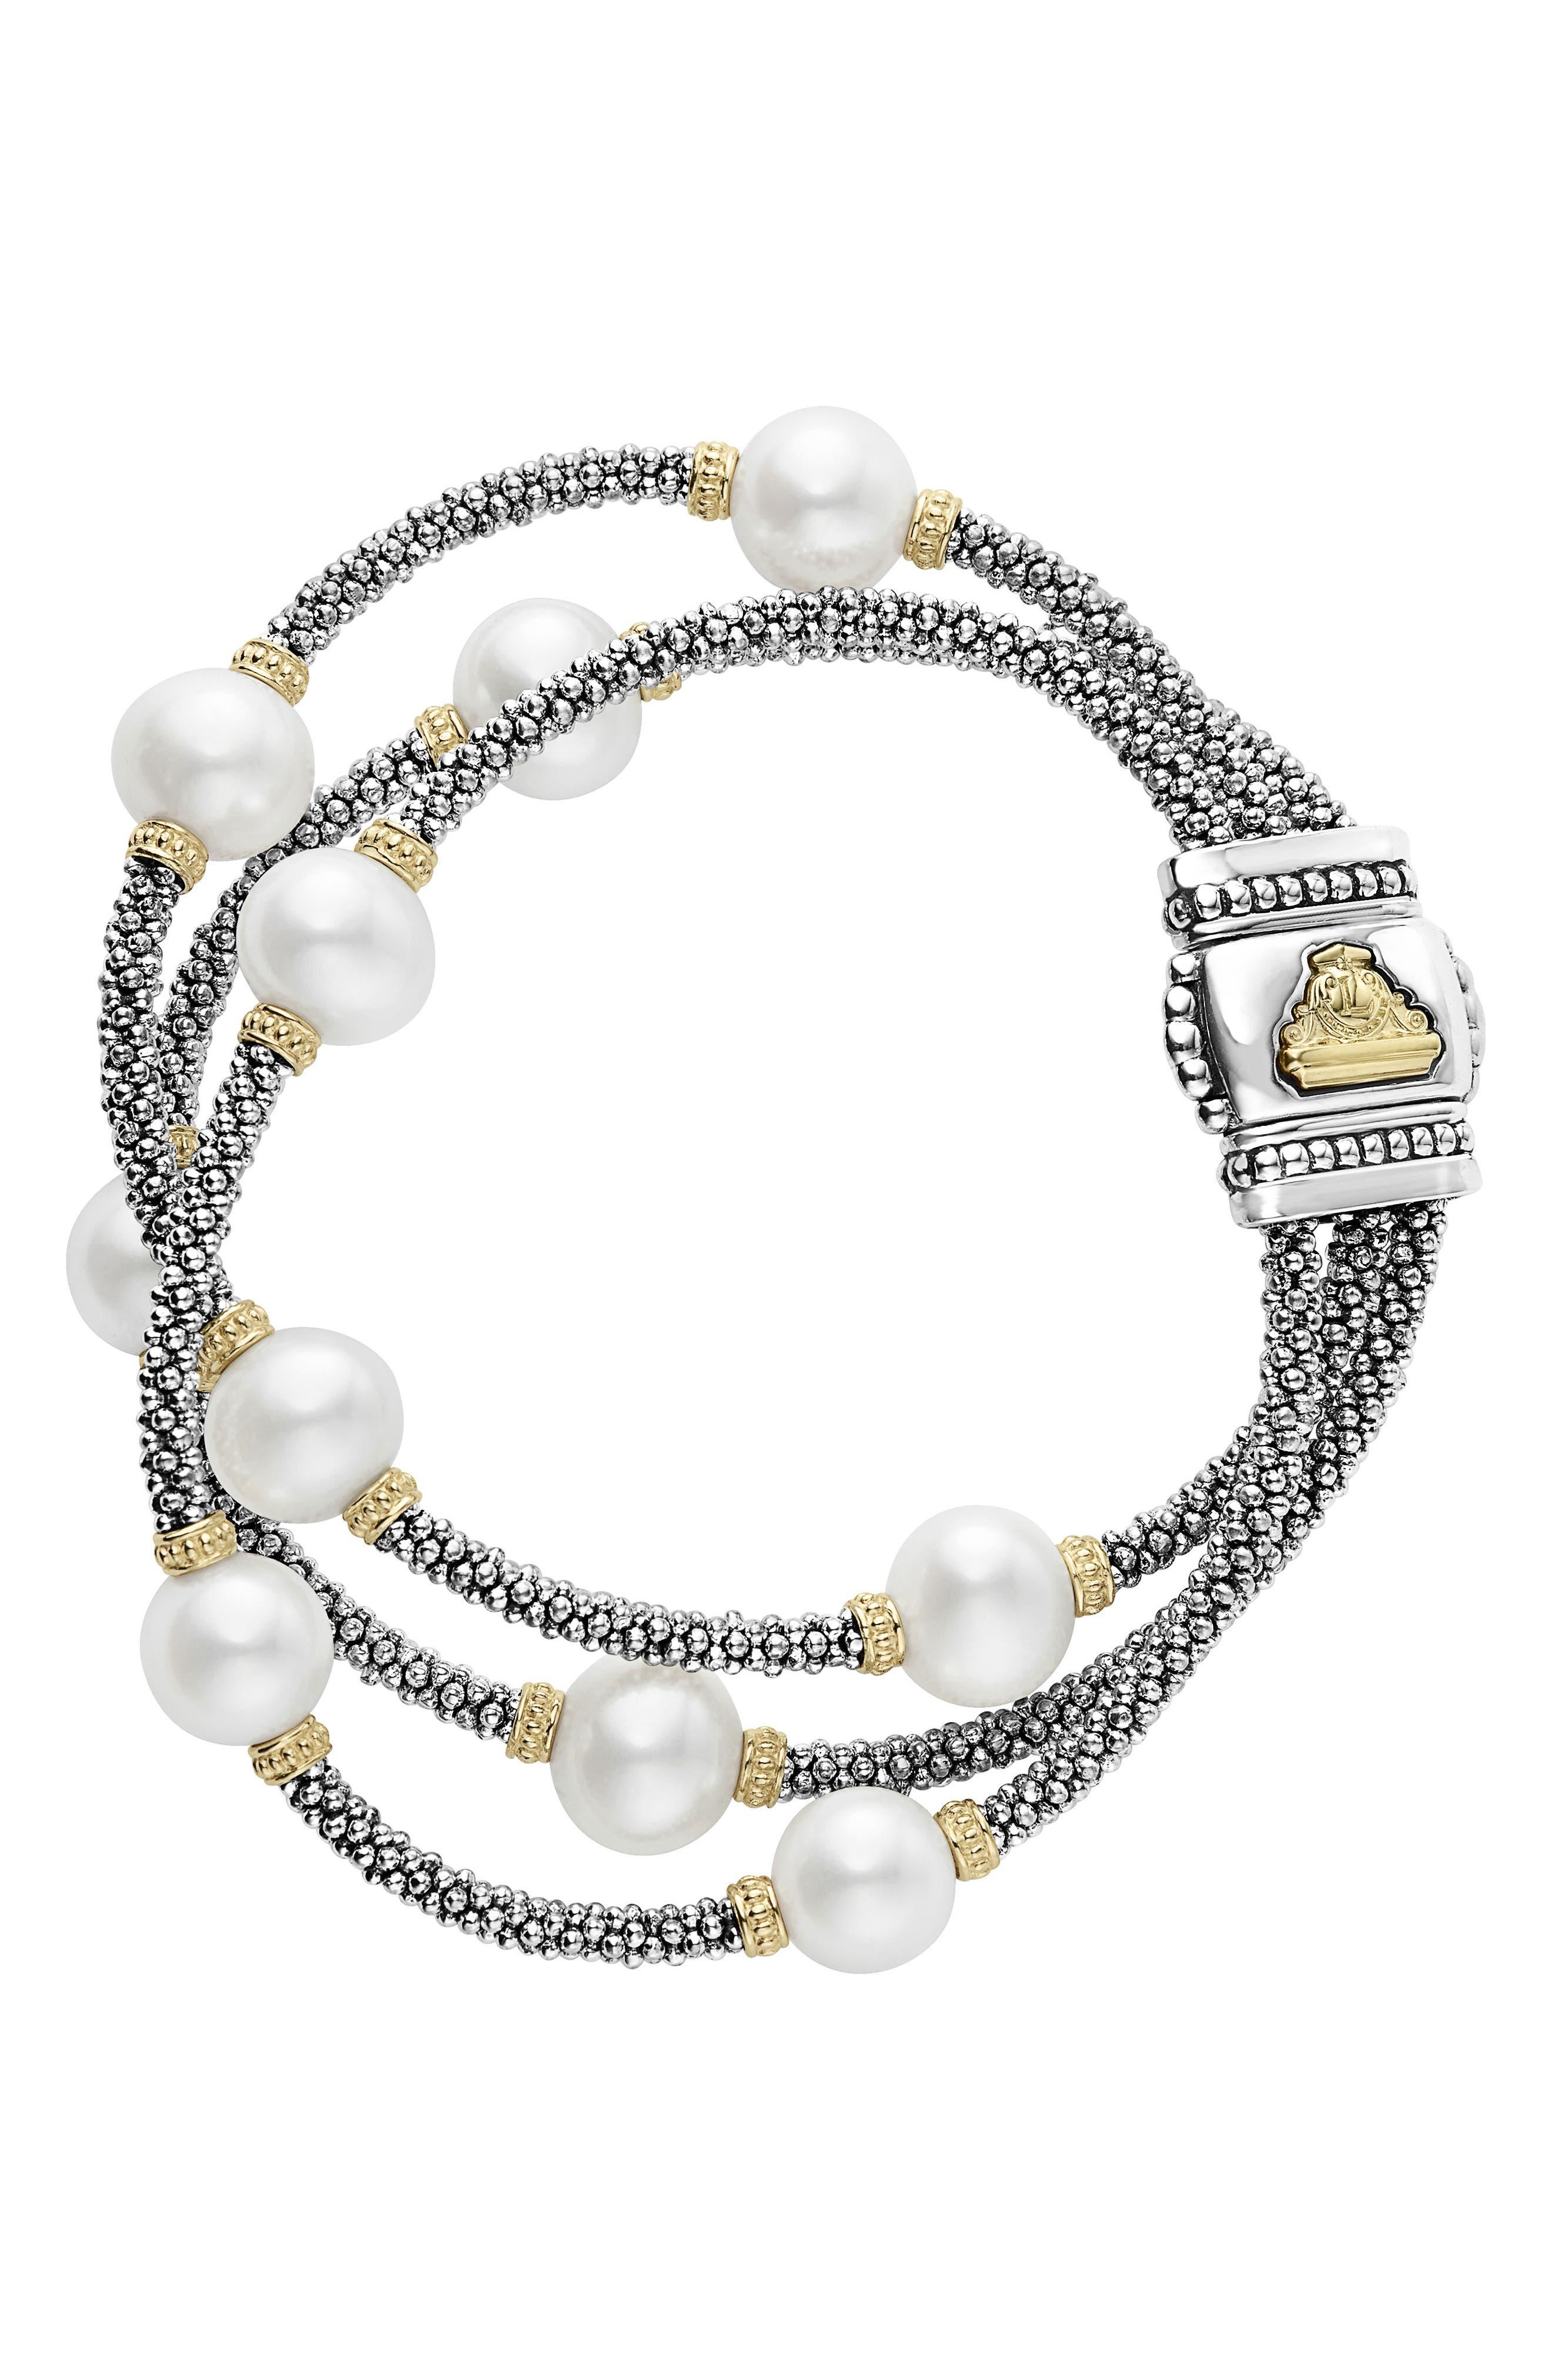 Alternate Image 1 Selected - LAGOS Luna Pearl Caviar Multistrand Bracelet